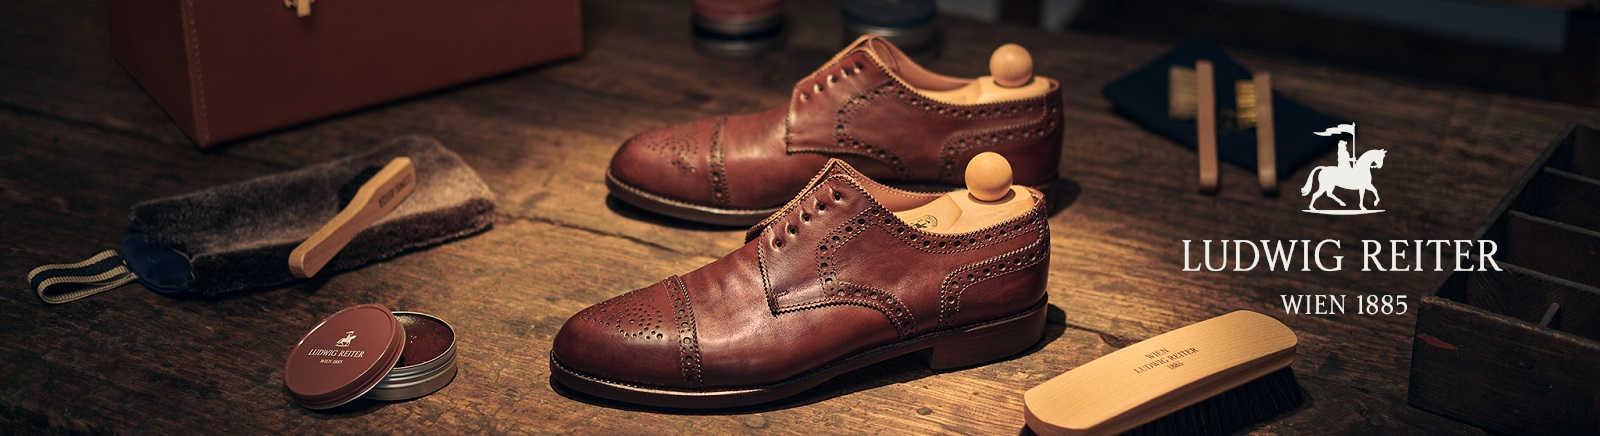 Ludwig Reiter Herrenschuhe online entdecken im Juppen Schuhe Shop